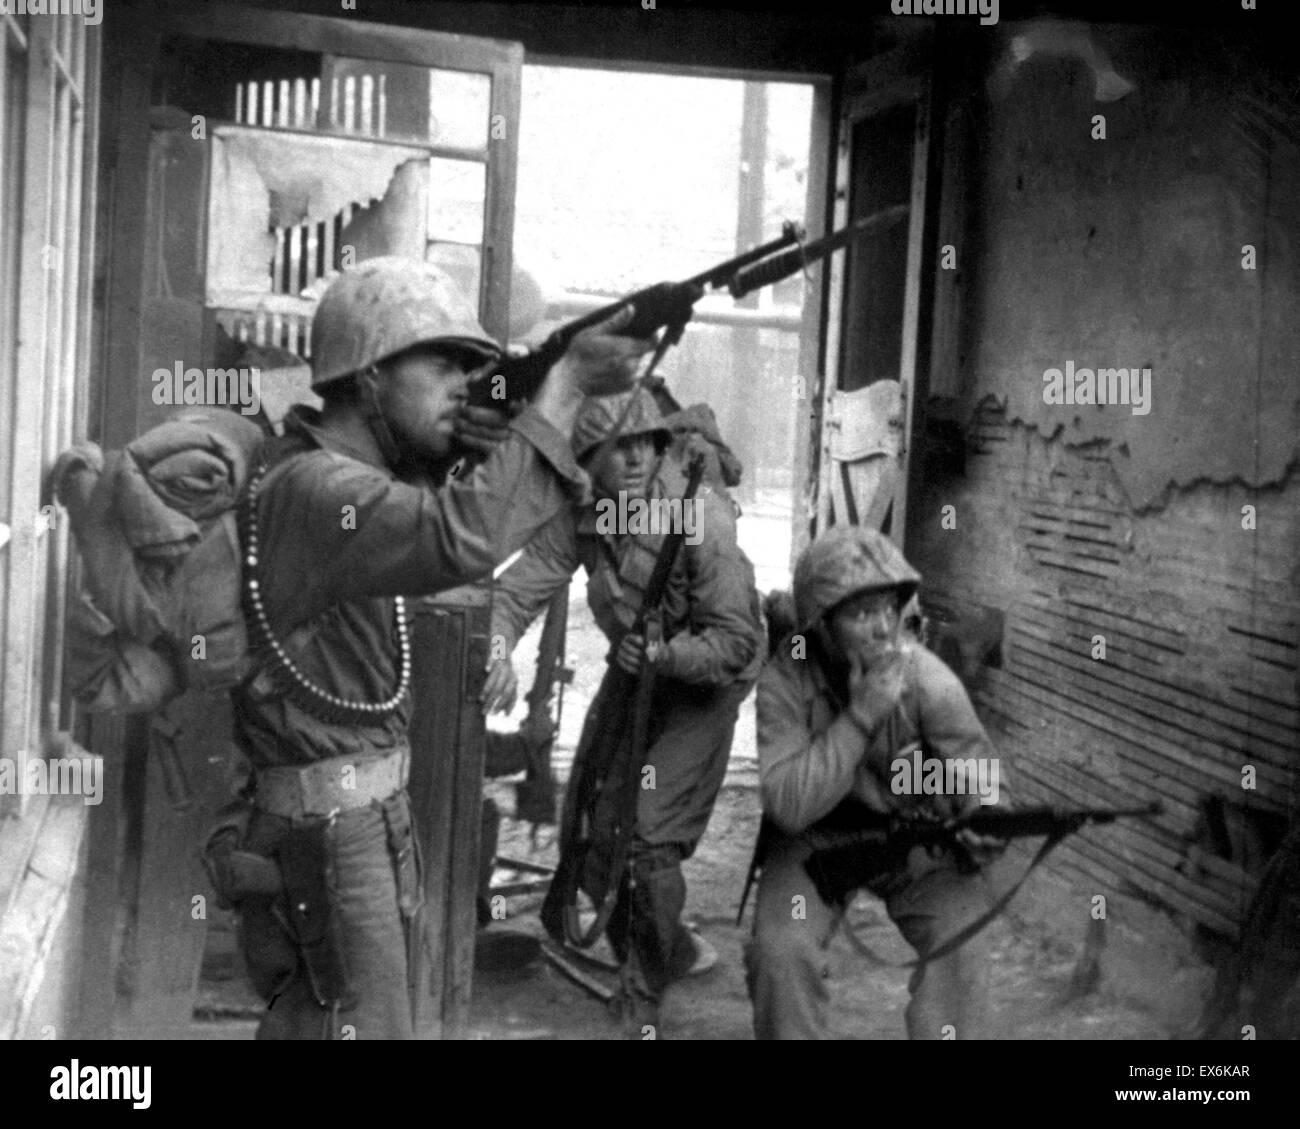 Lieutenant Robert Strickland, Corporal John Romanowski of the US army in action Korea 1950 - Stock Image